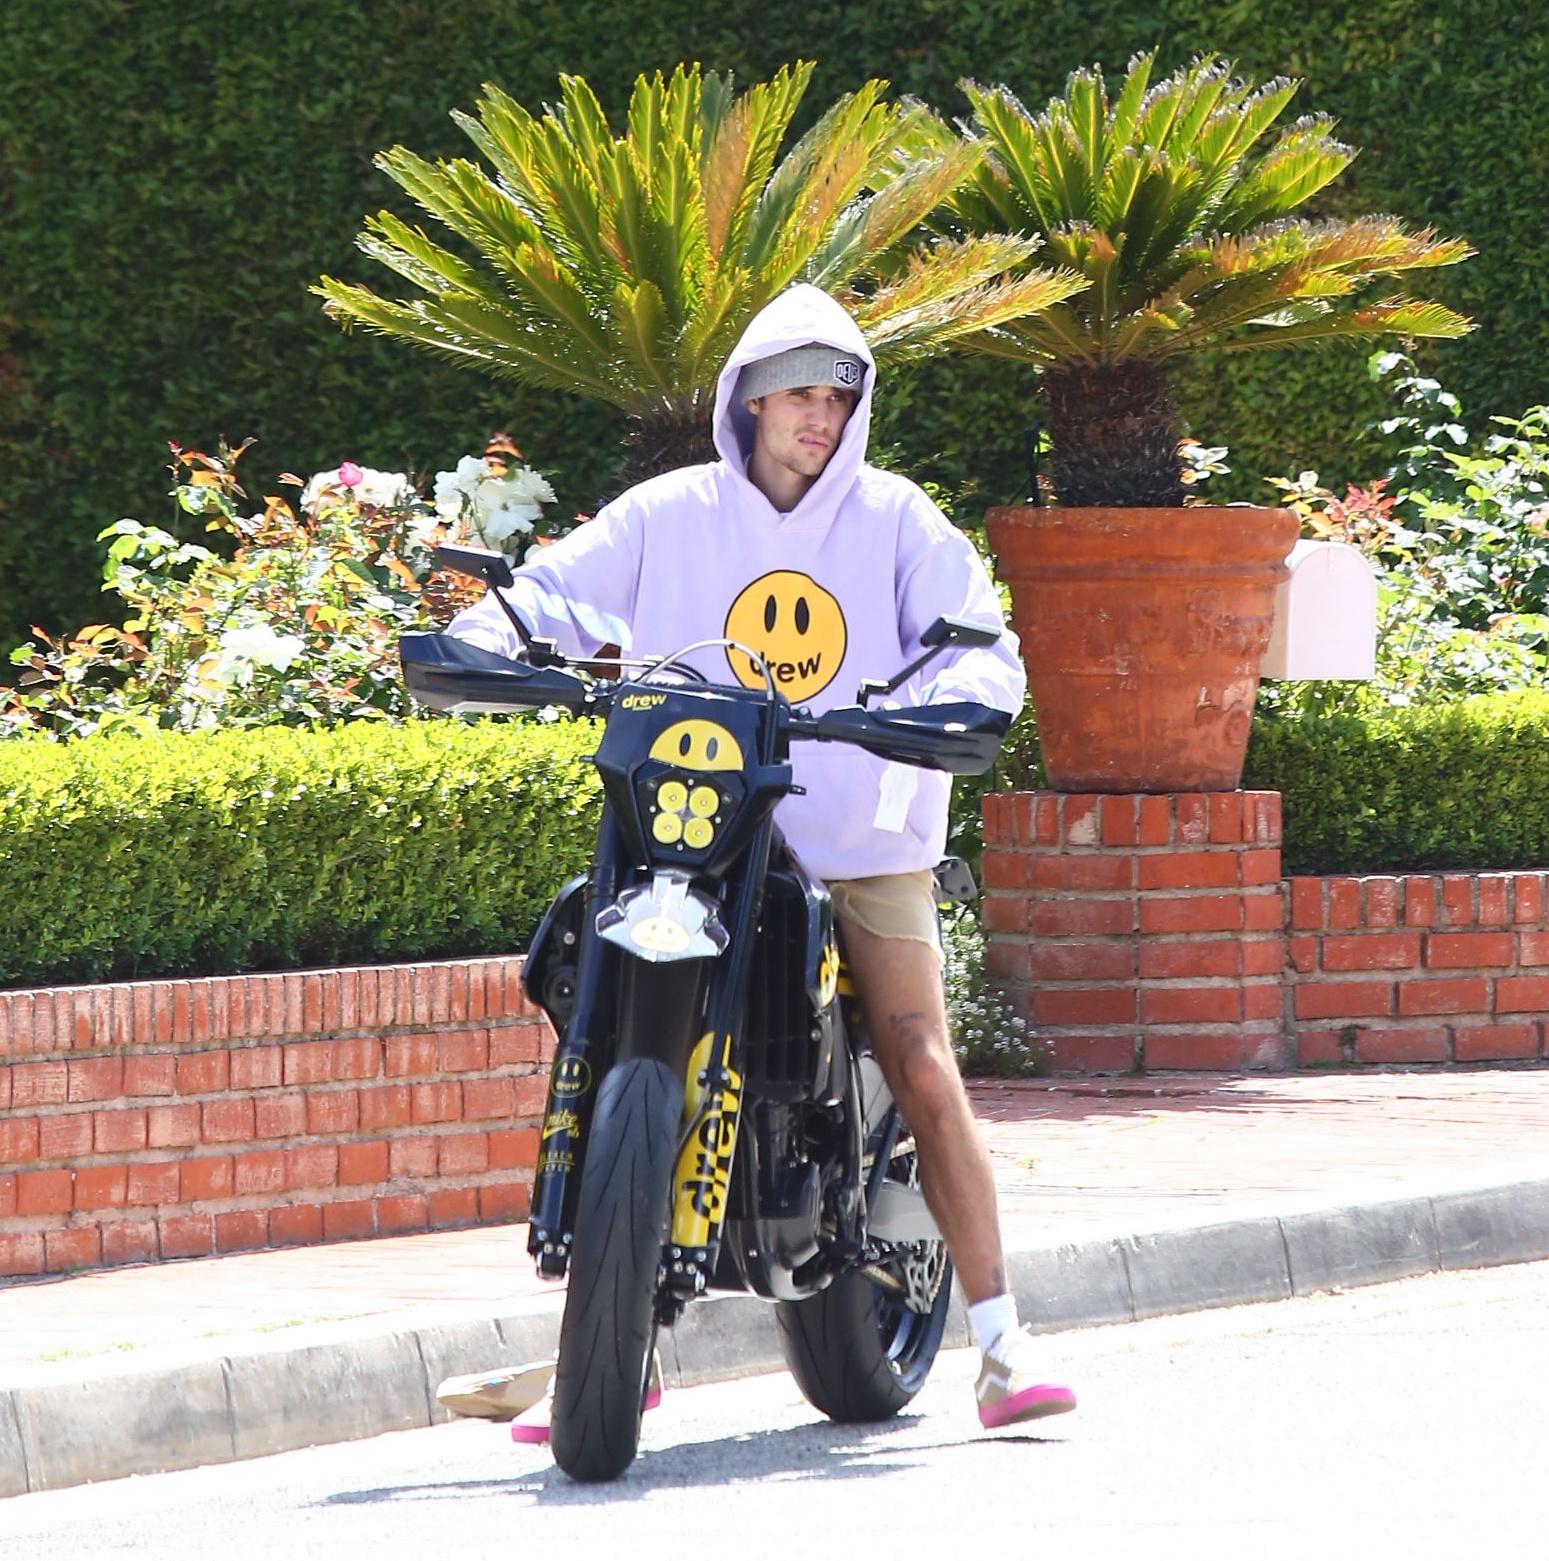 "<em><span class=""exclusive"">EXCLUSIVE VIDEO</span></em> - Justin Bieber Gets A New Custom Motocross Bike - X17 Online"